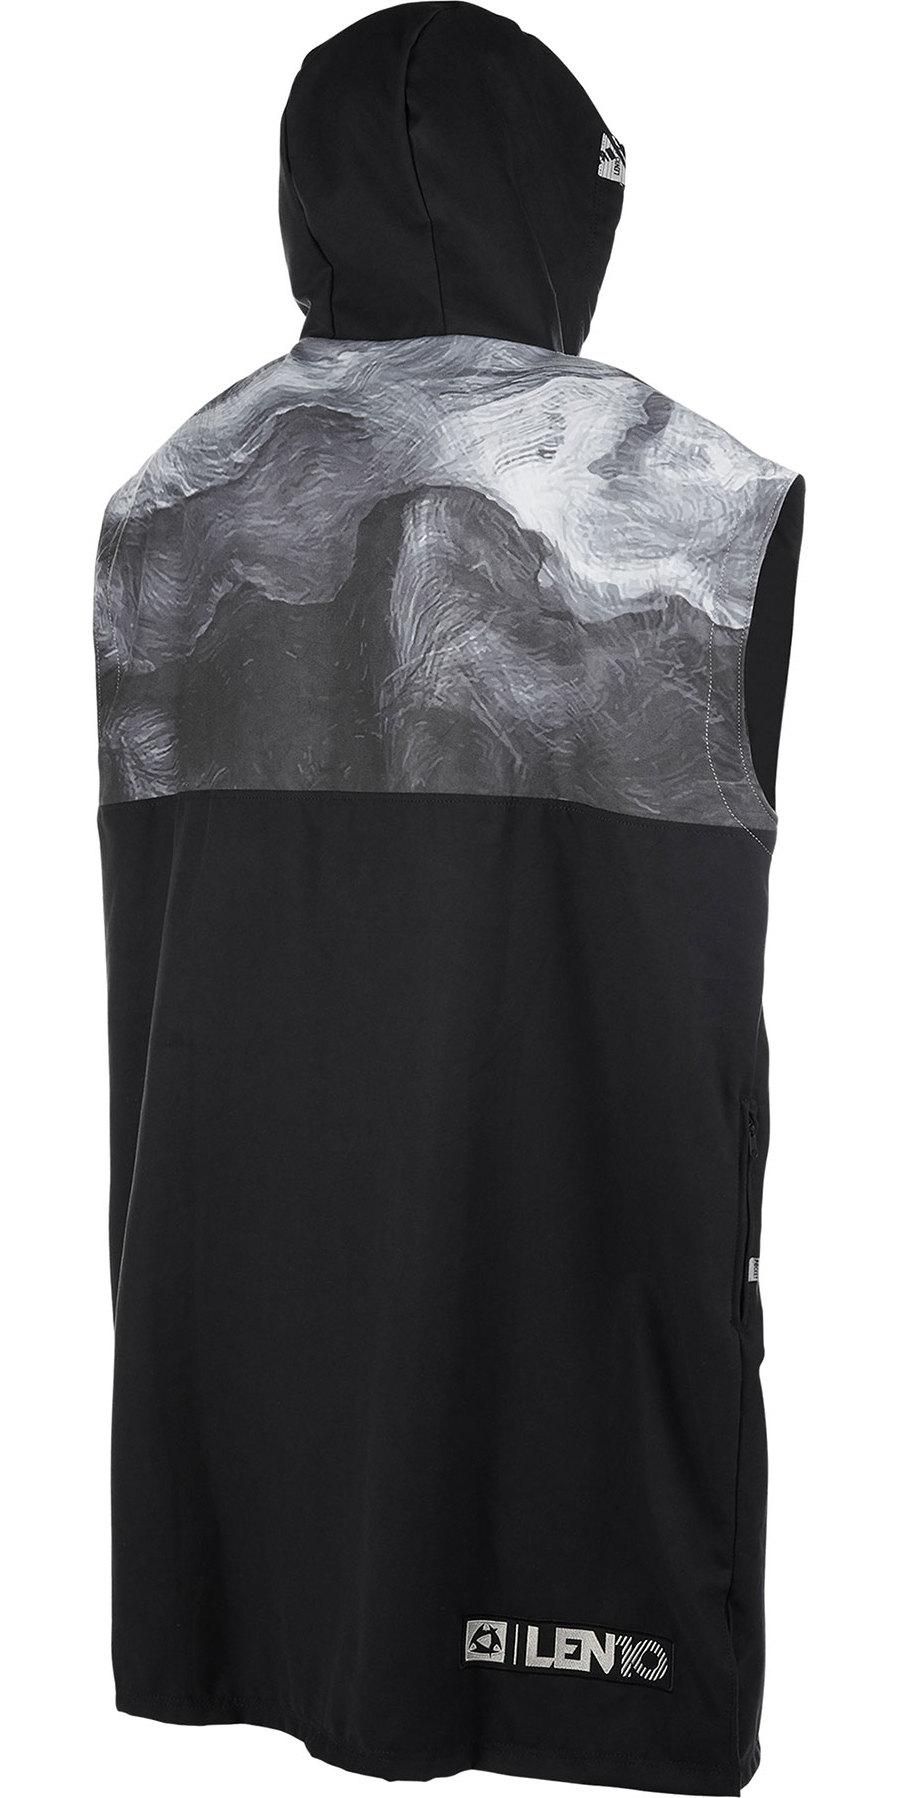 2019 Mystic QD Len10 Poncho / Change Robe Black White 190166